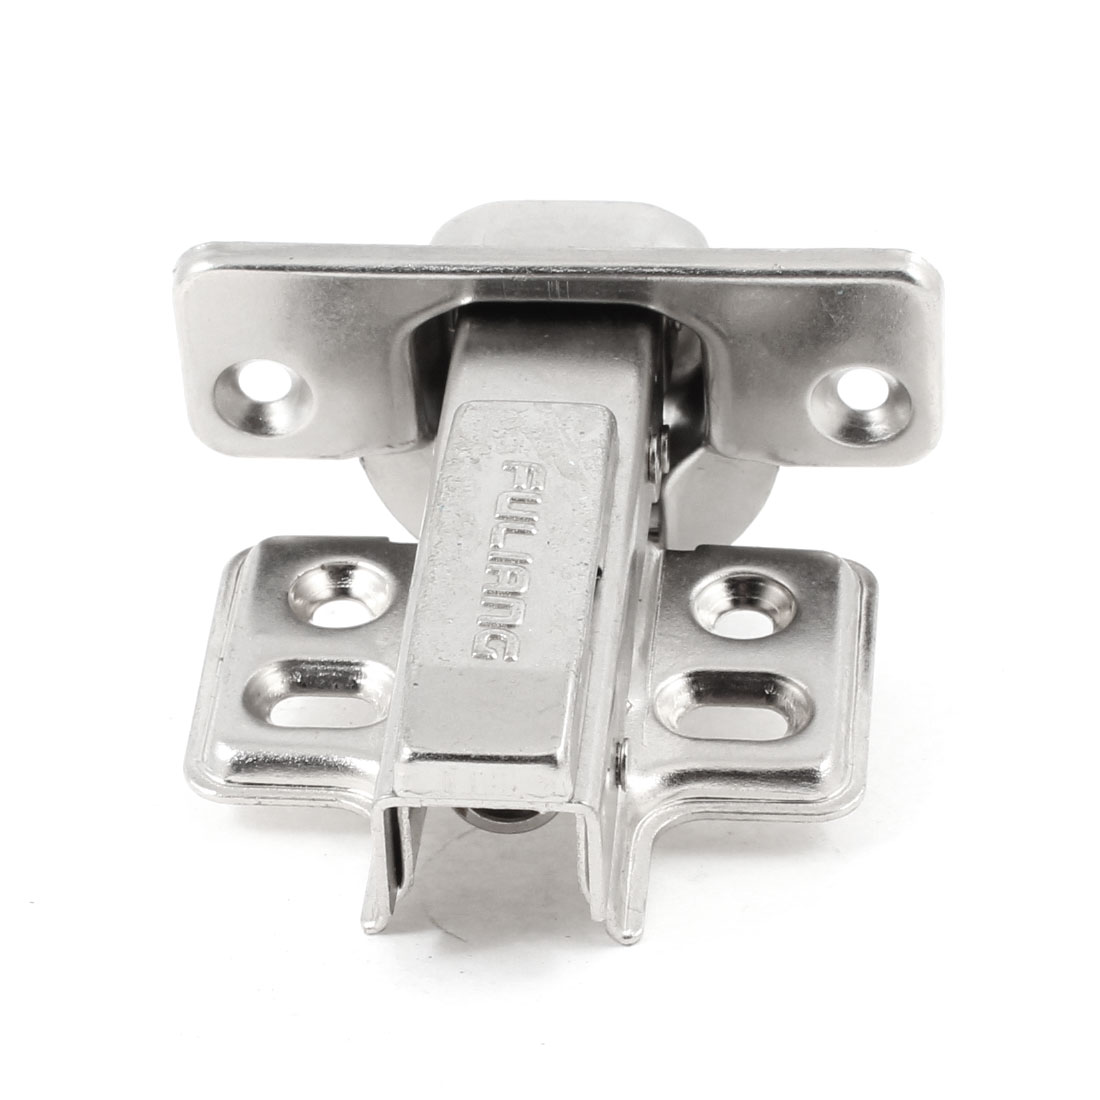 Hardware Part 4.2mm Diameter Mounting Hole Buffer Cabinet Door Hinge Silver Tone